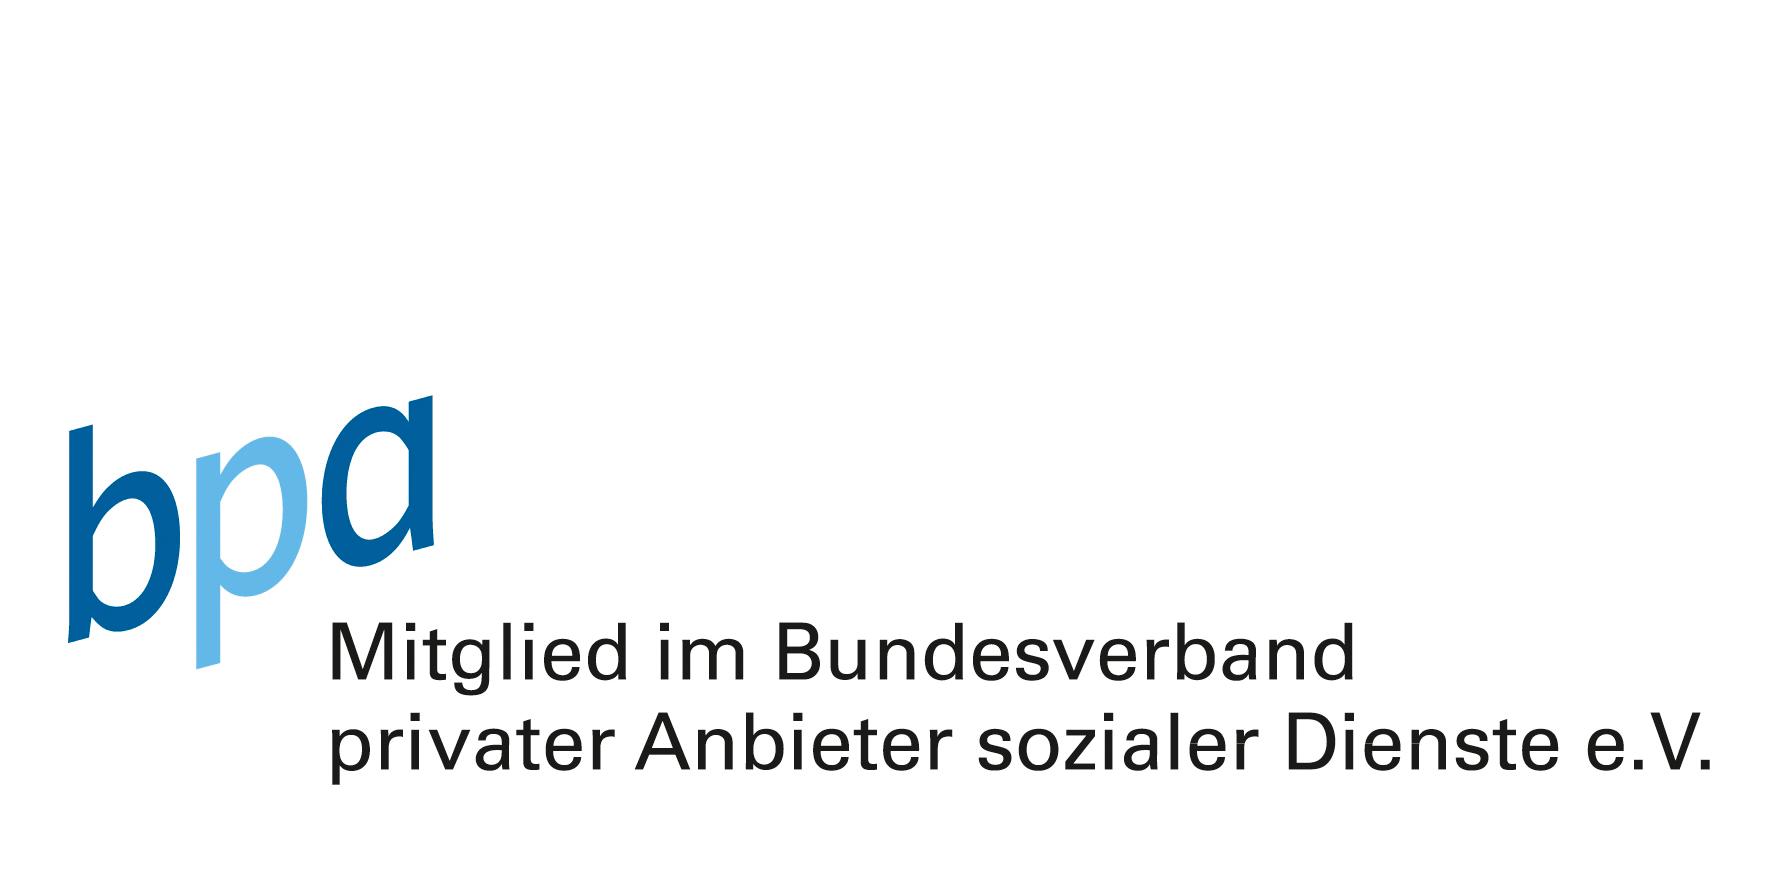 Logo des bpa - Bundesverband privater Anbieter sozialer Dienste e.V.